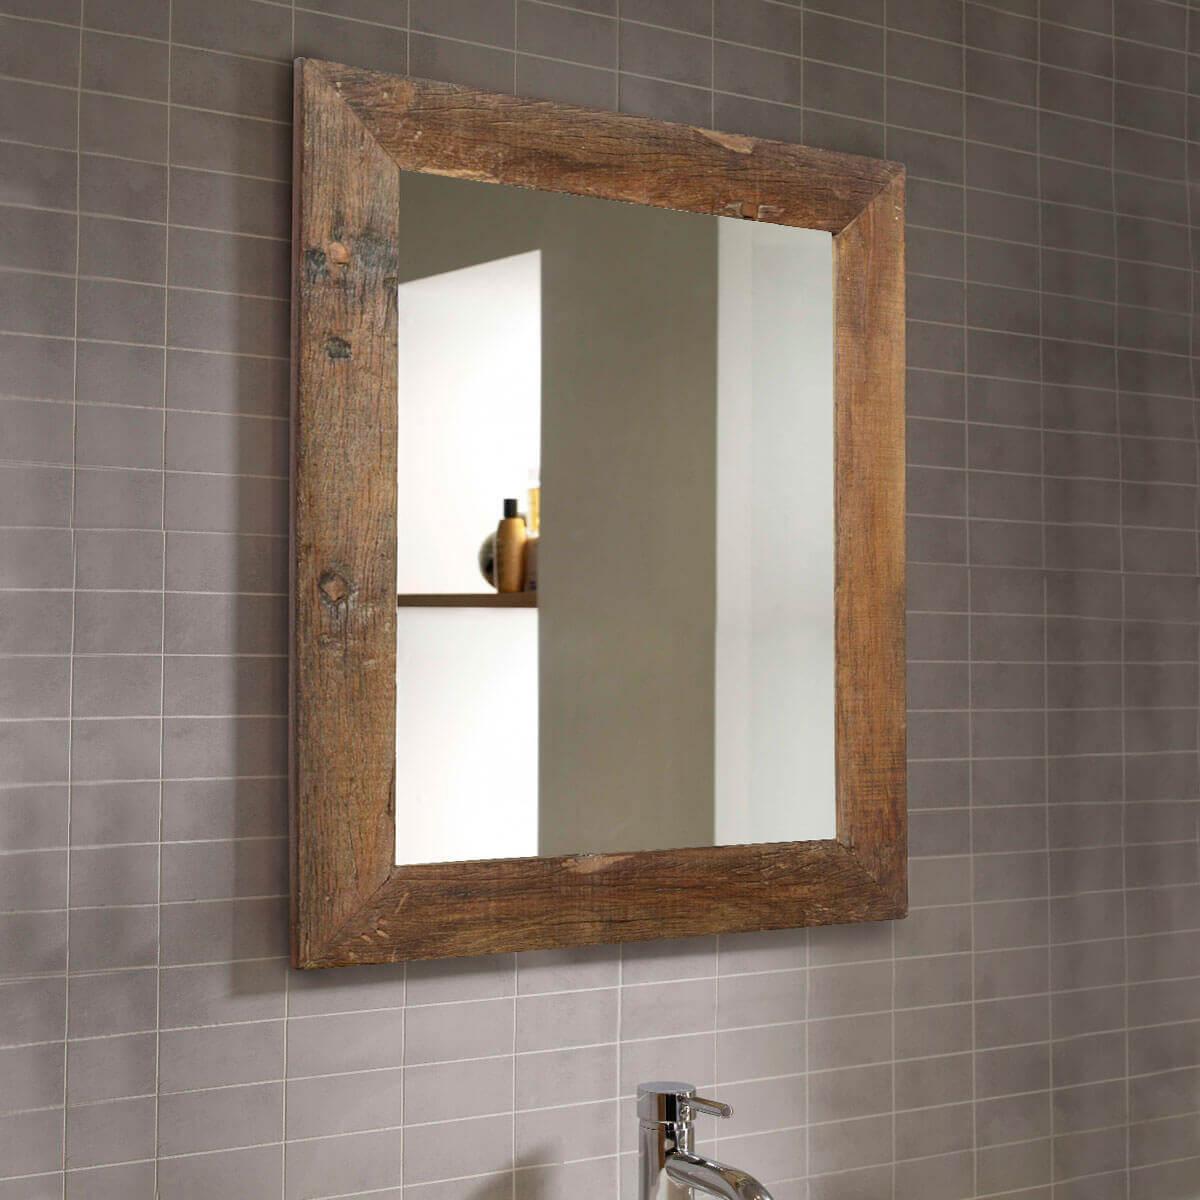 Appalachian Rustic Large Reclaimed Wood Wall Mirror w ...